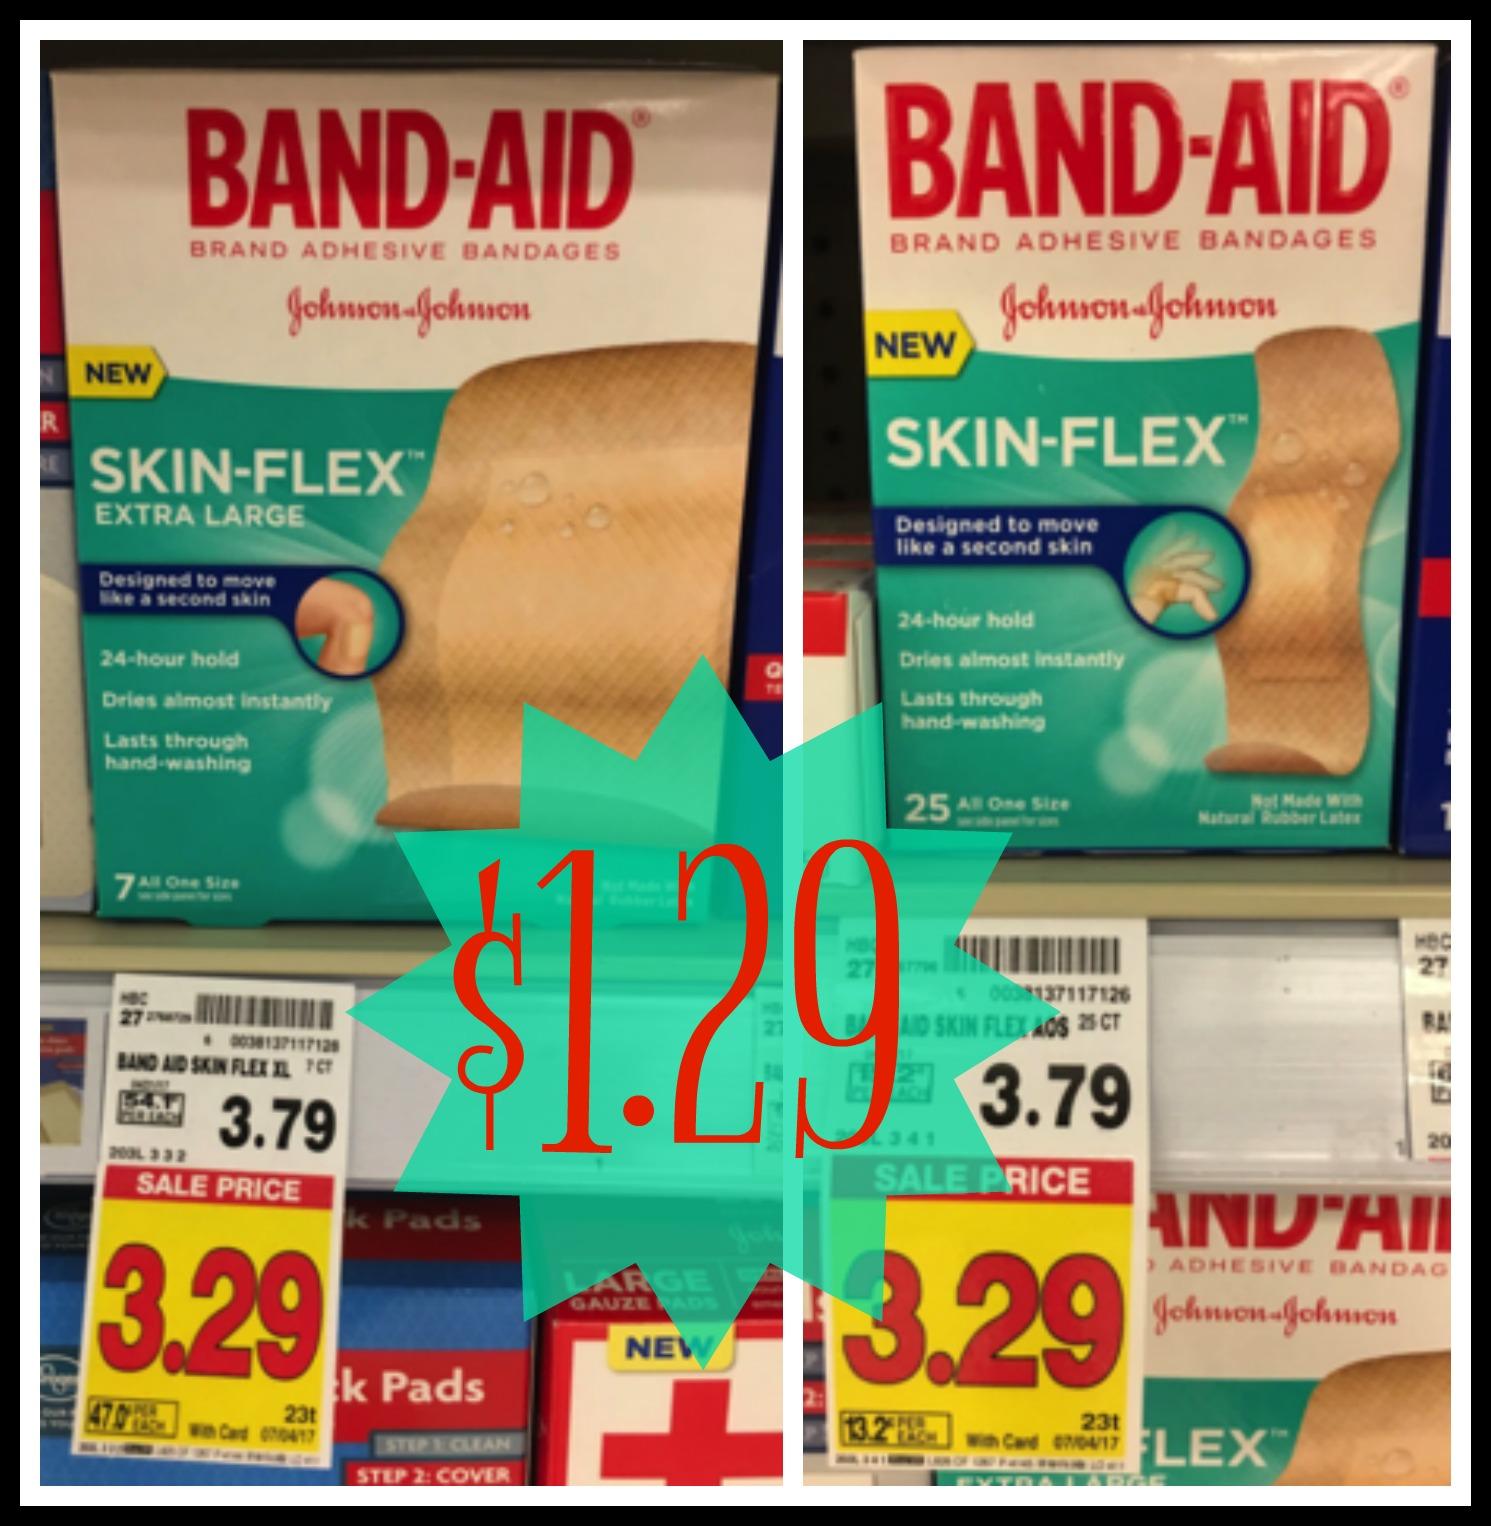 bandaid skin flex Image